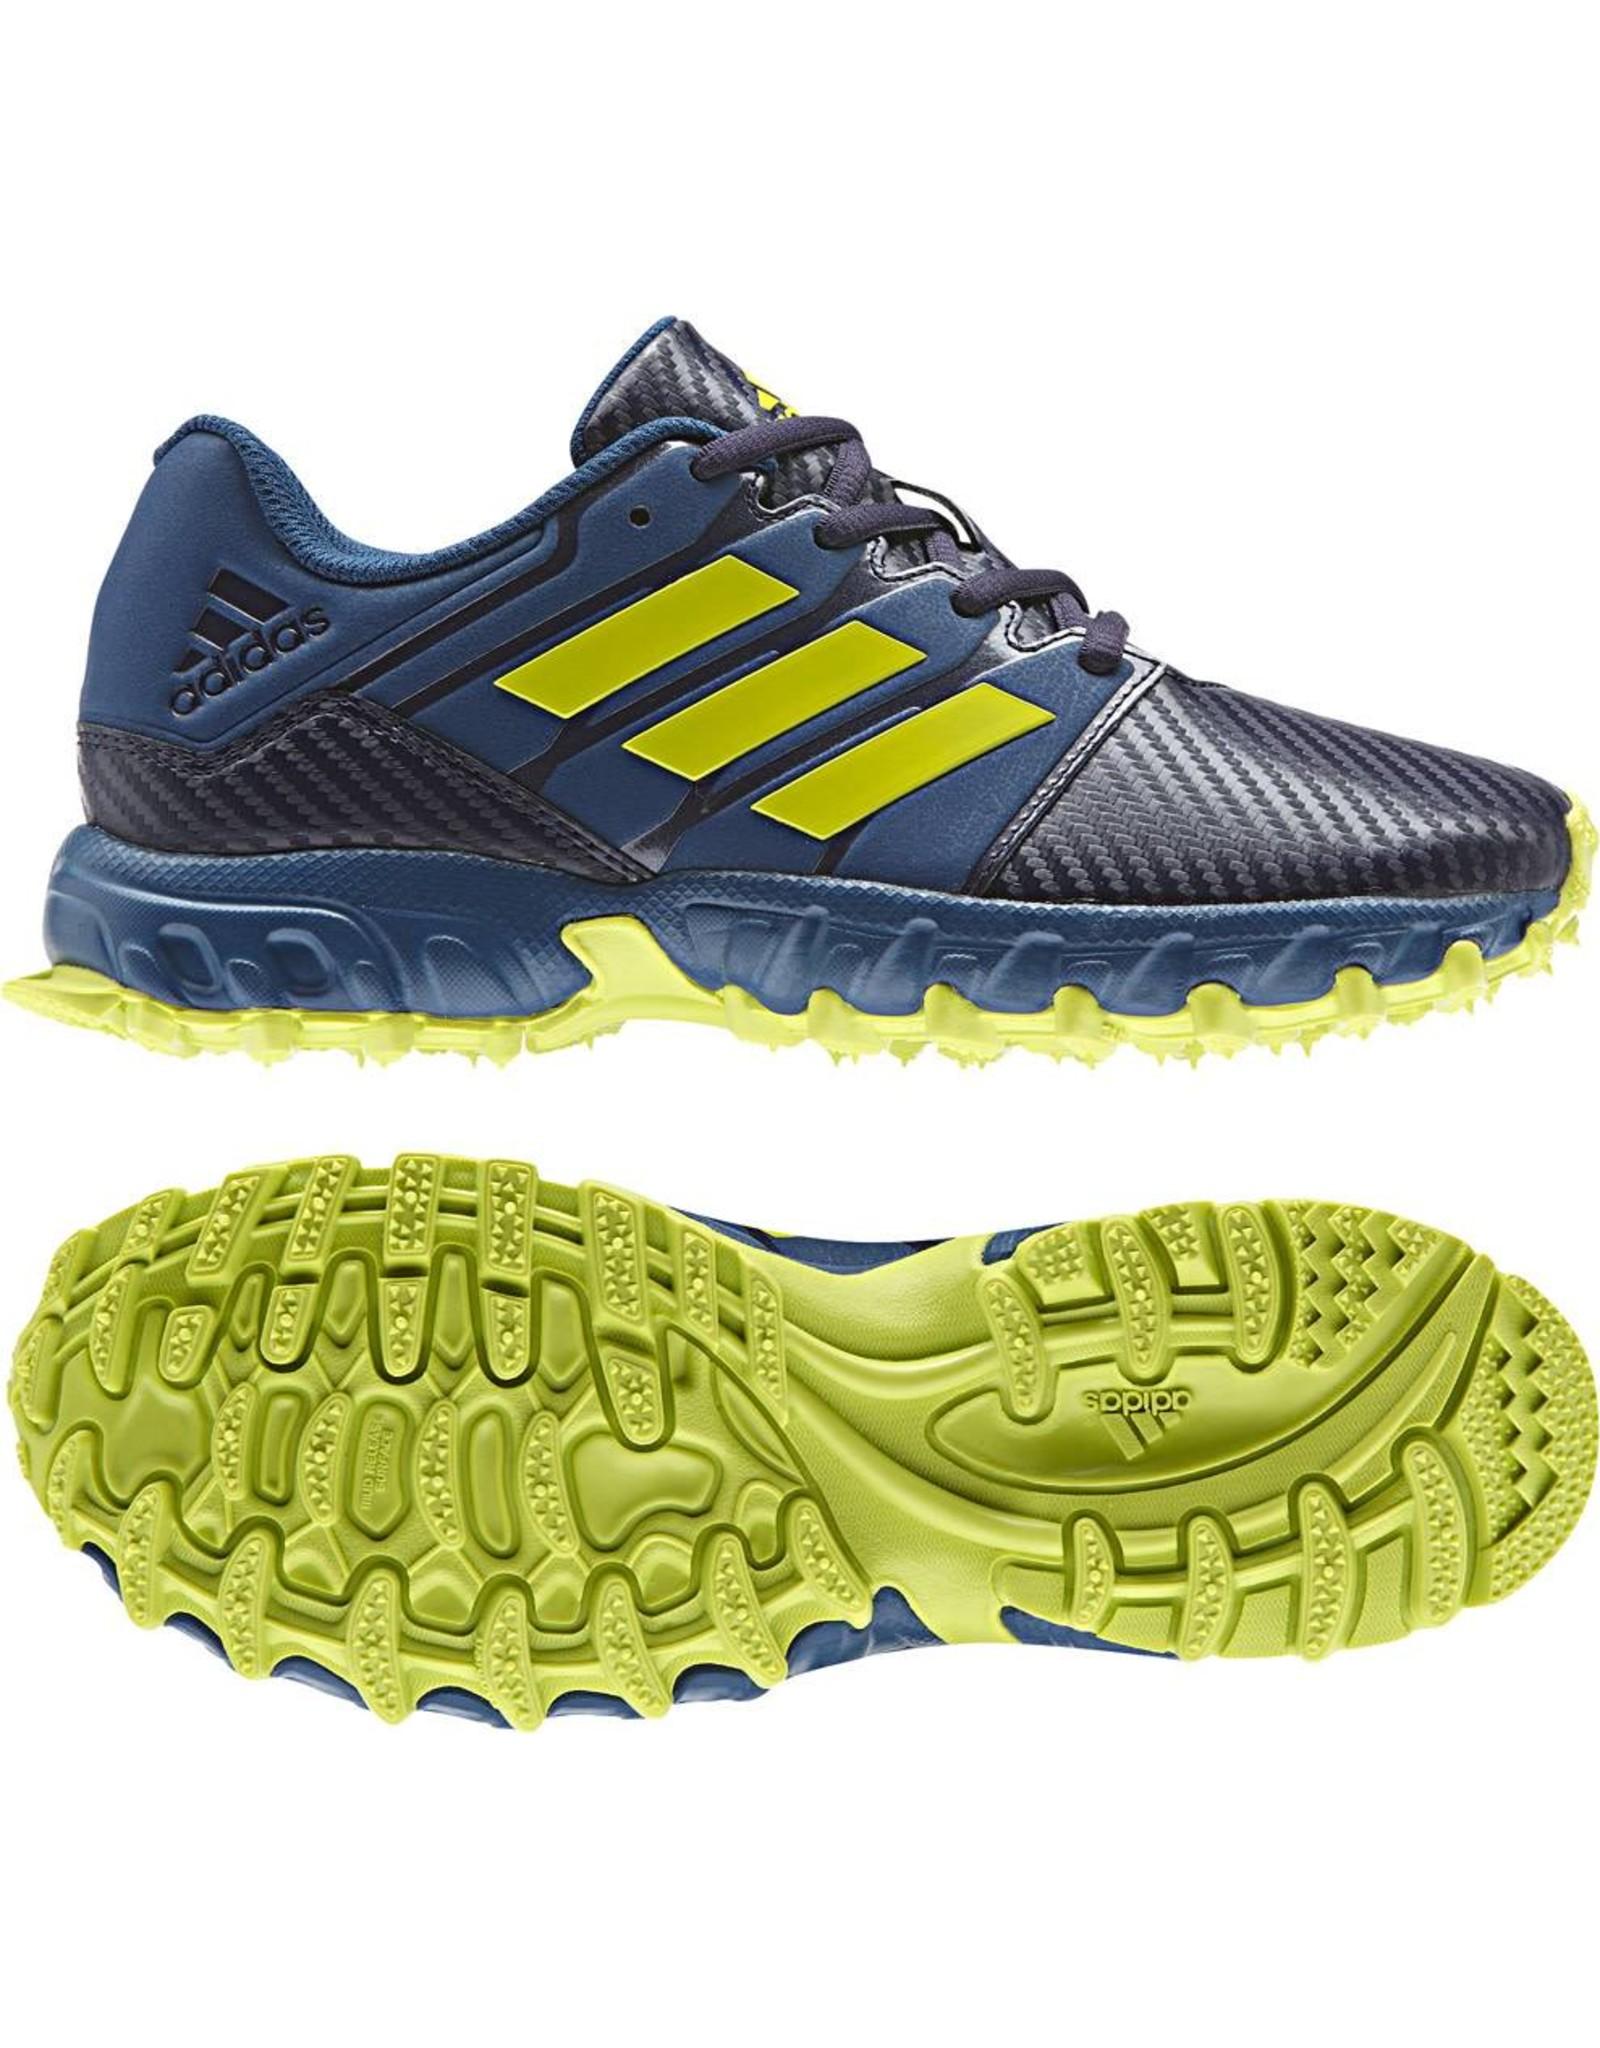 ADIDAS adidas Hockey Junior Blue/Yellow 30 17/18